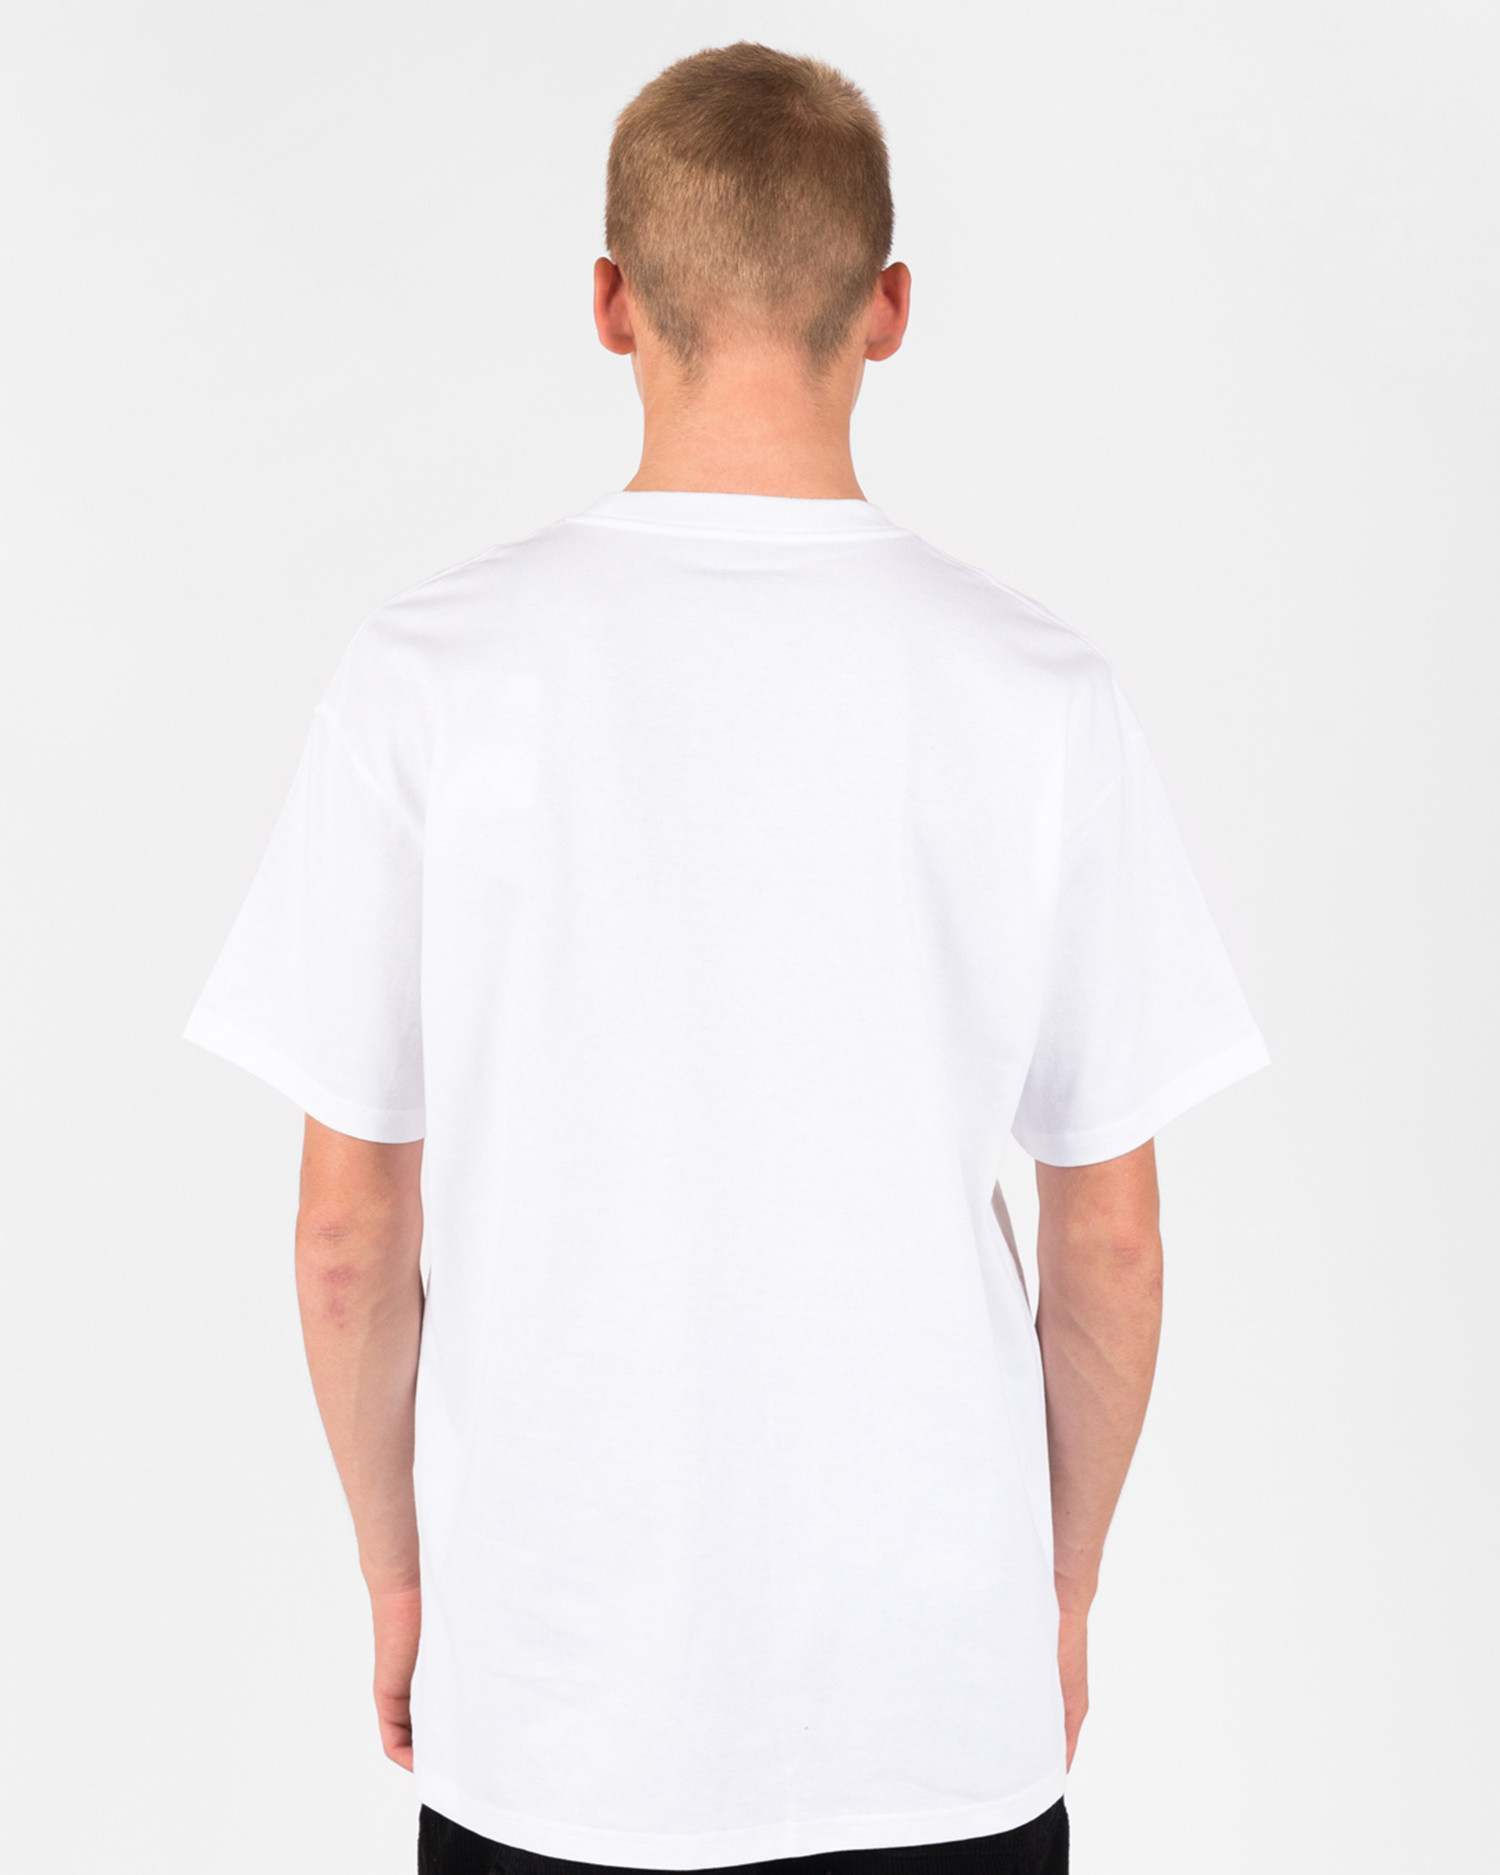 Carhartt Scorpions T-Shirt White/Boysenberry